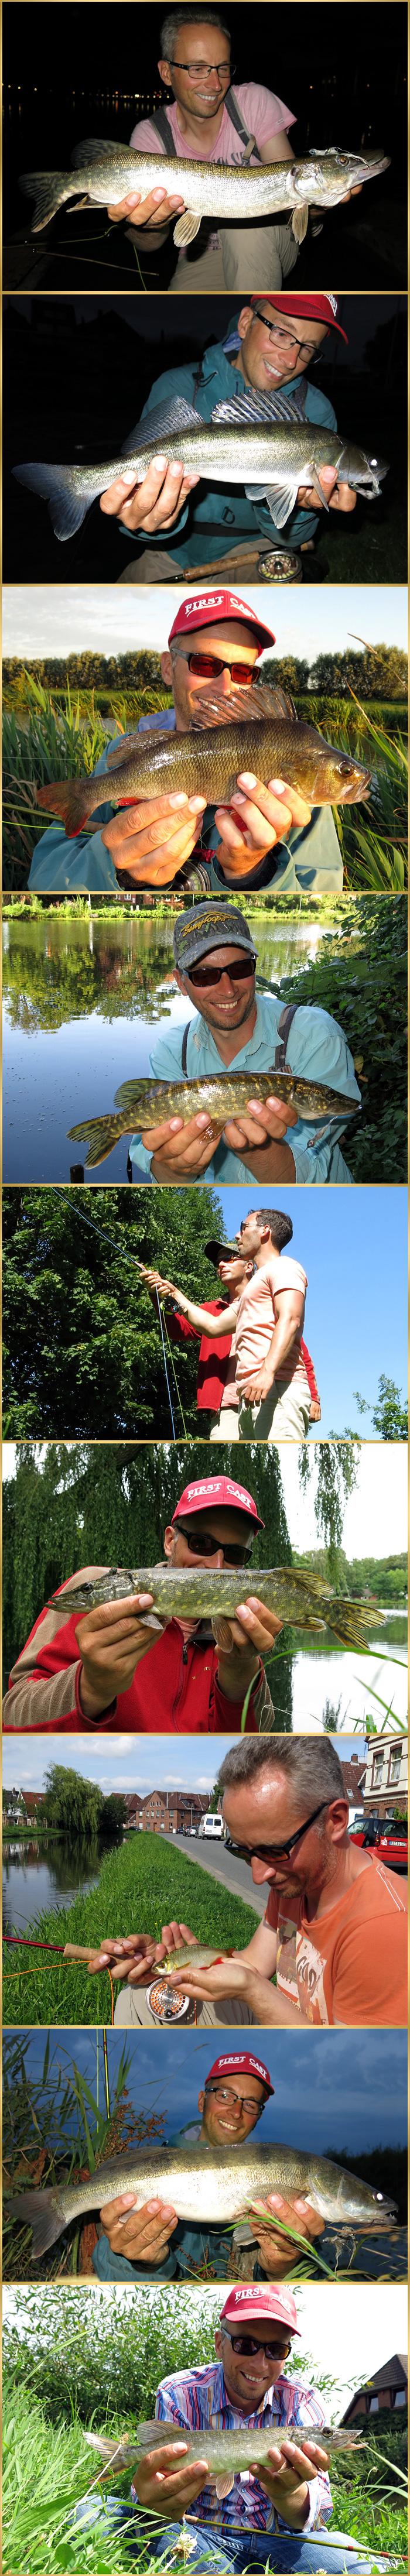 bernd ziesche fly fishing school